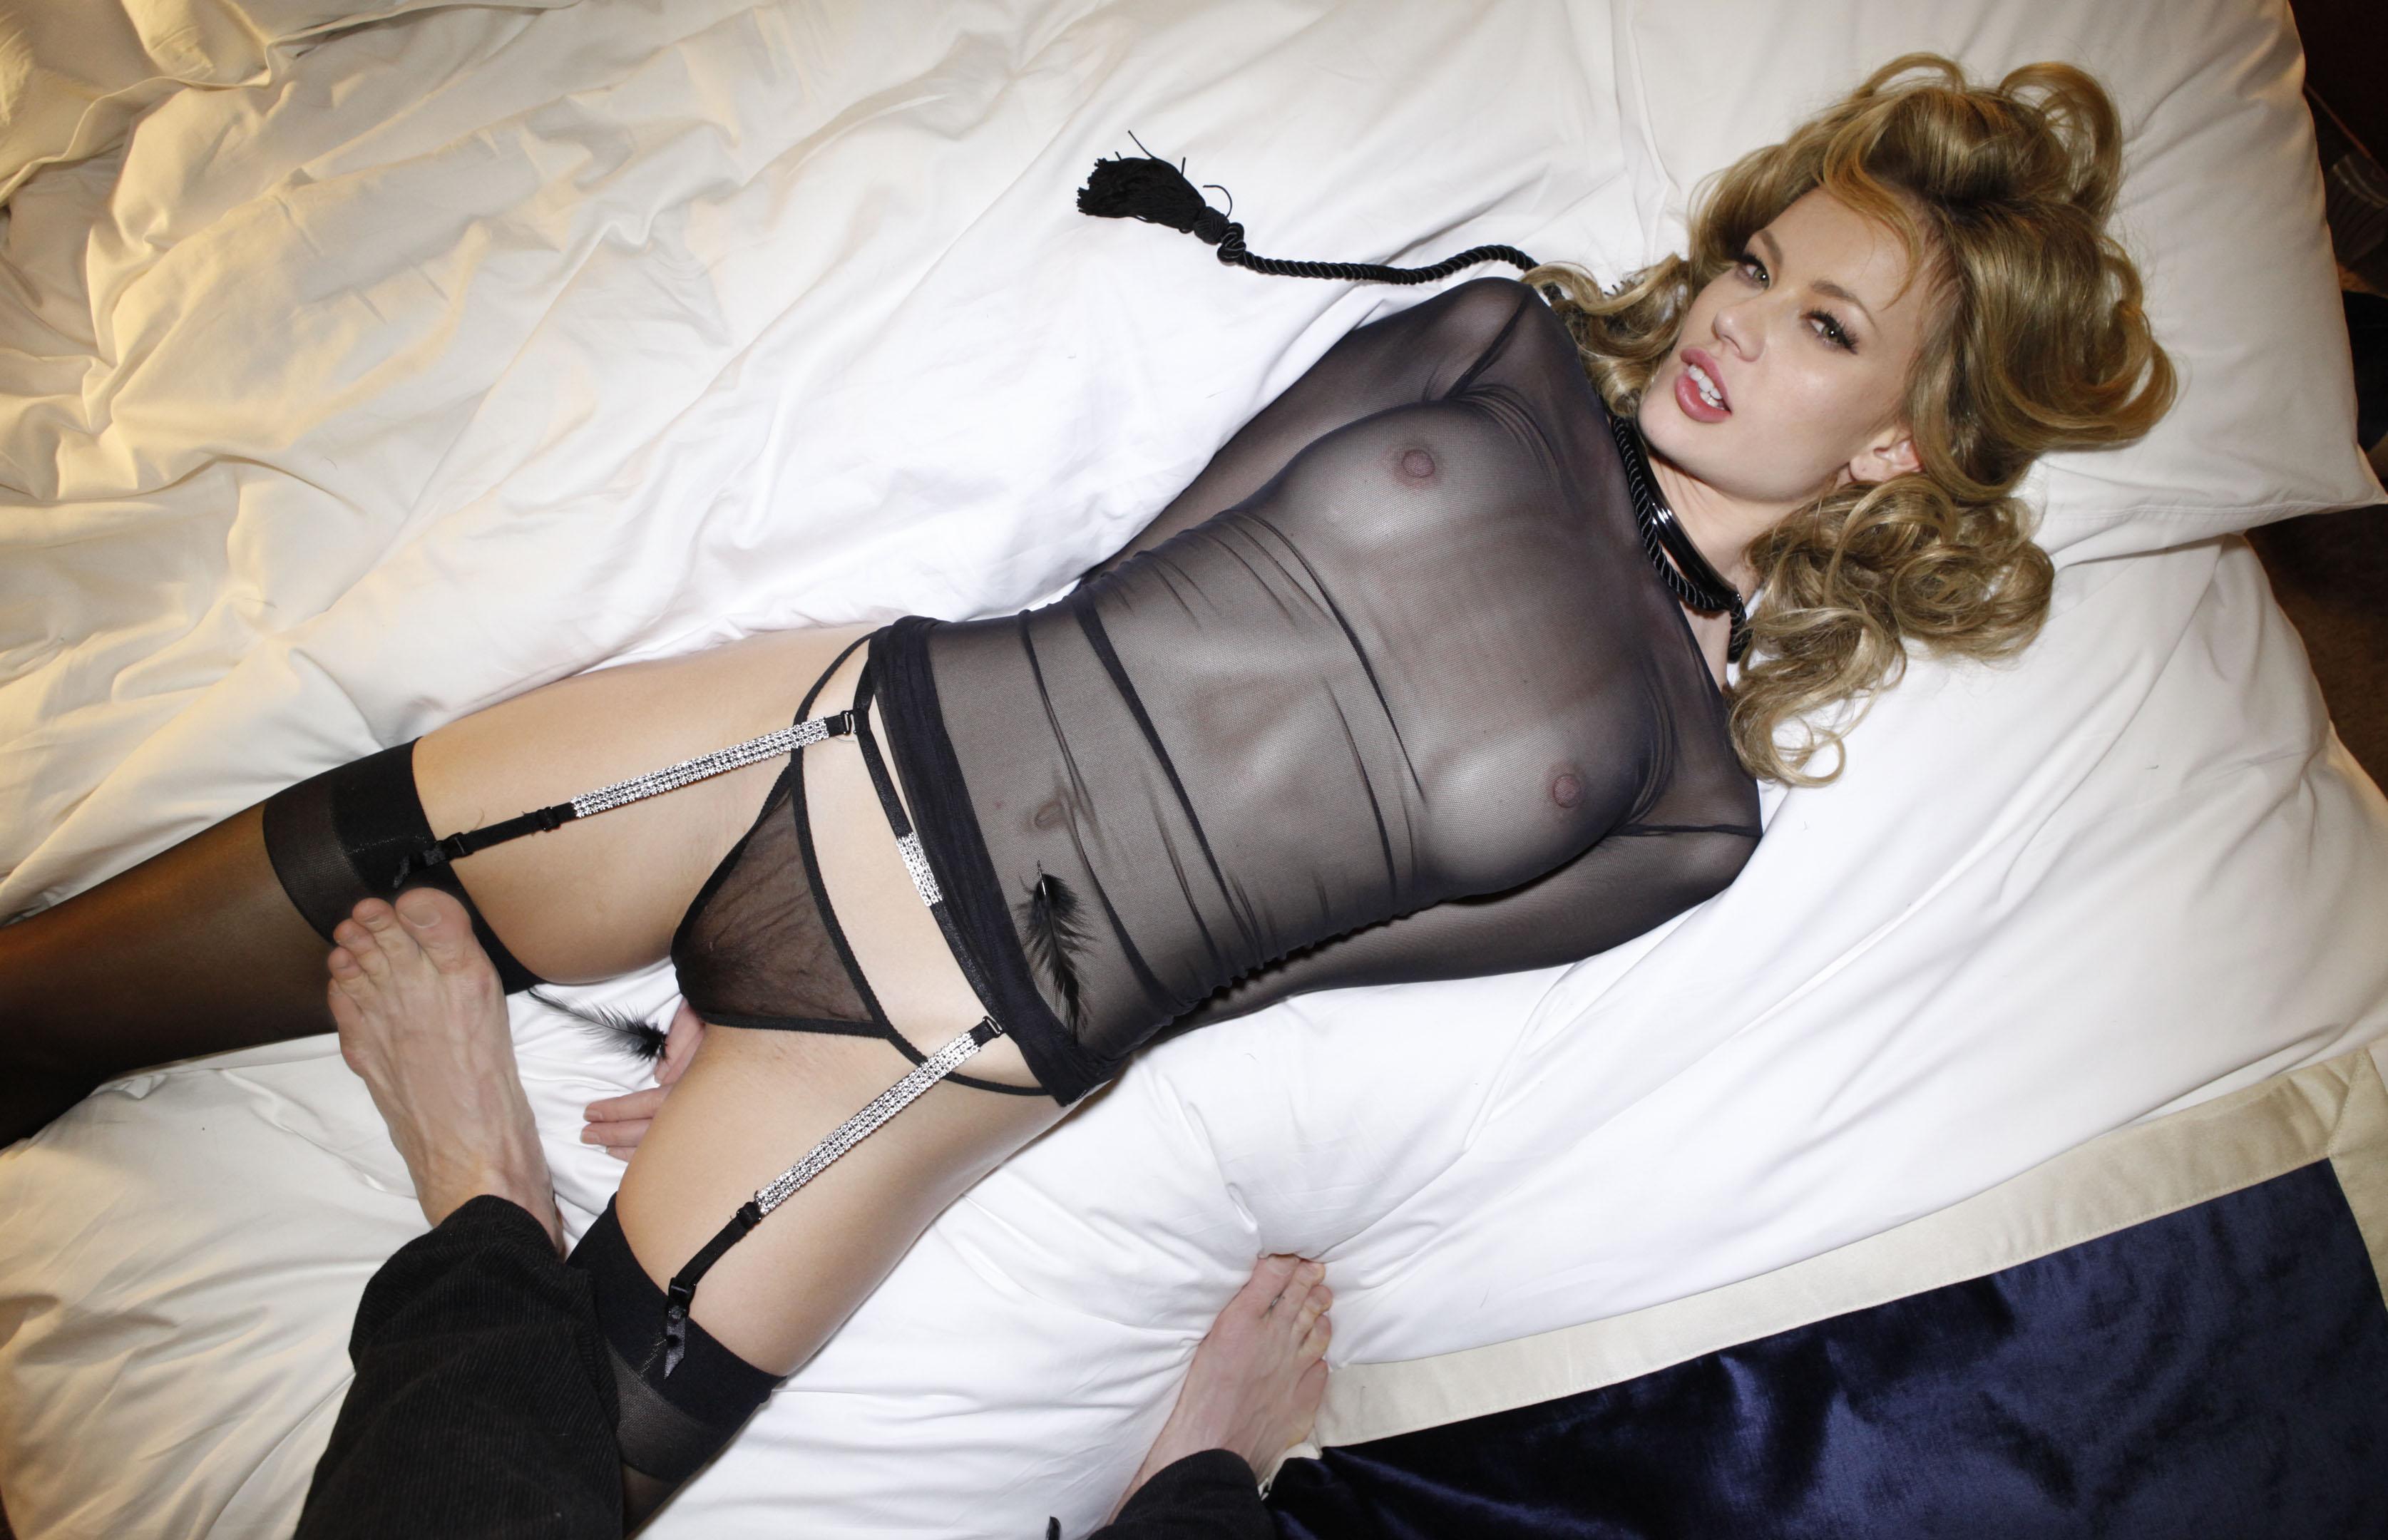 Stephaniemarchnude, hot babes fucking lesbian asian